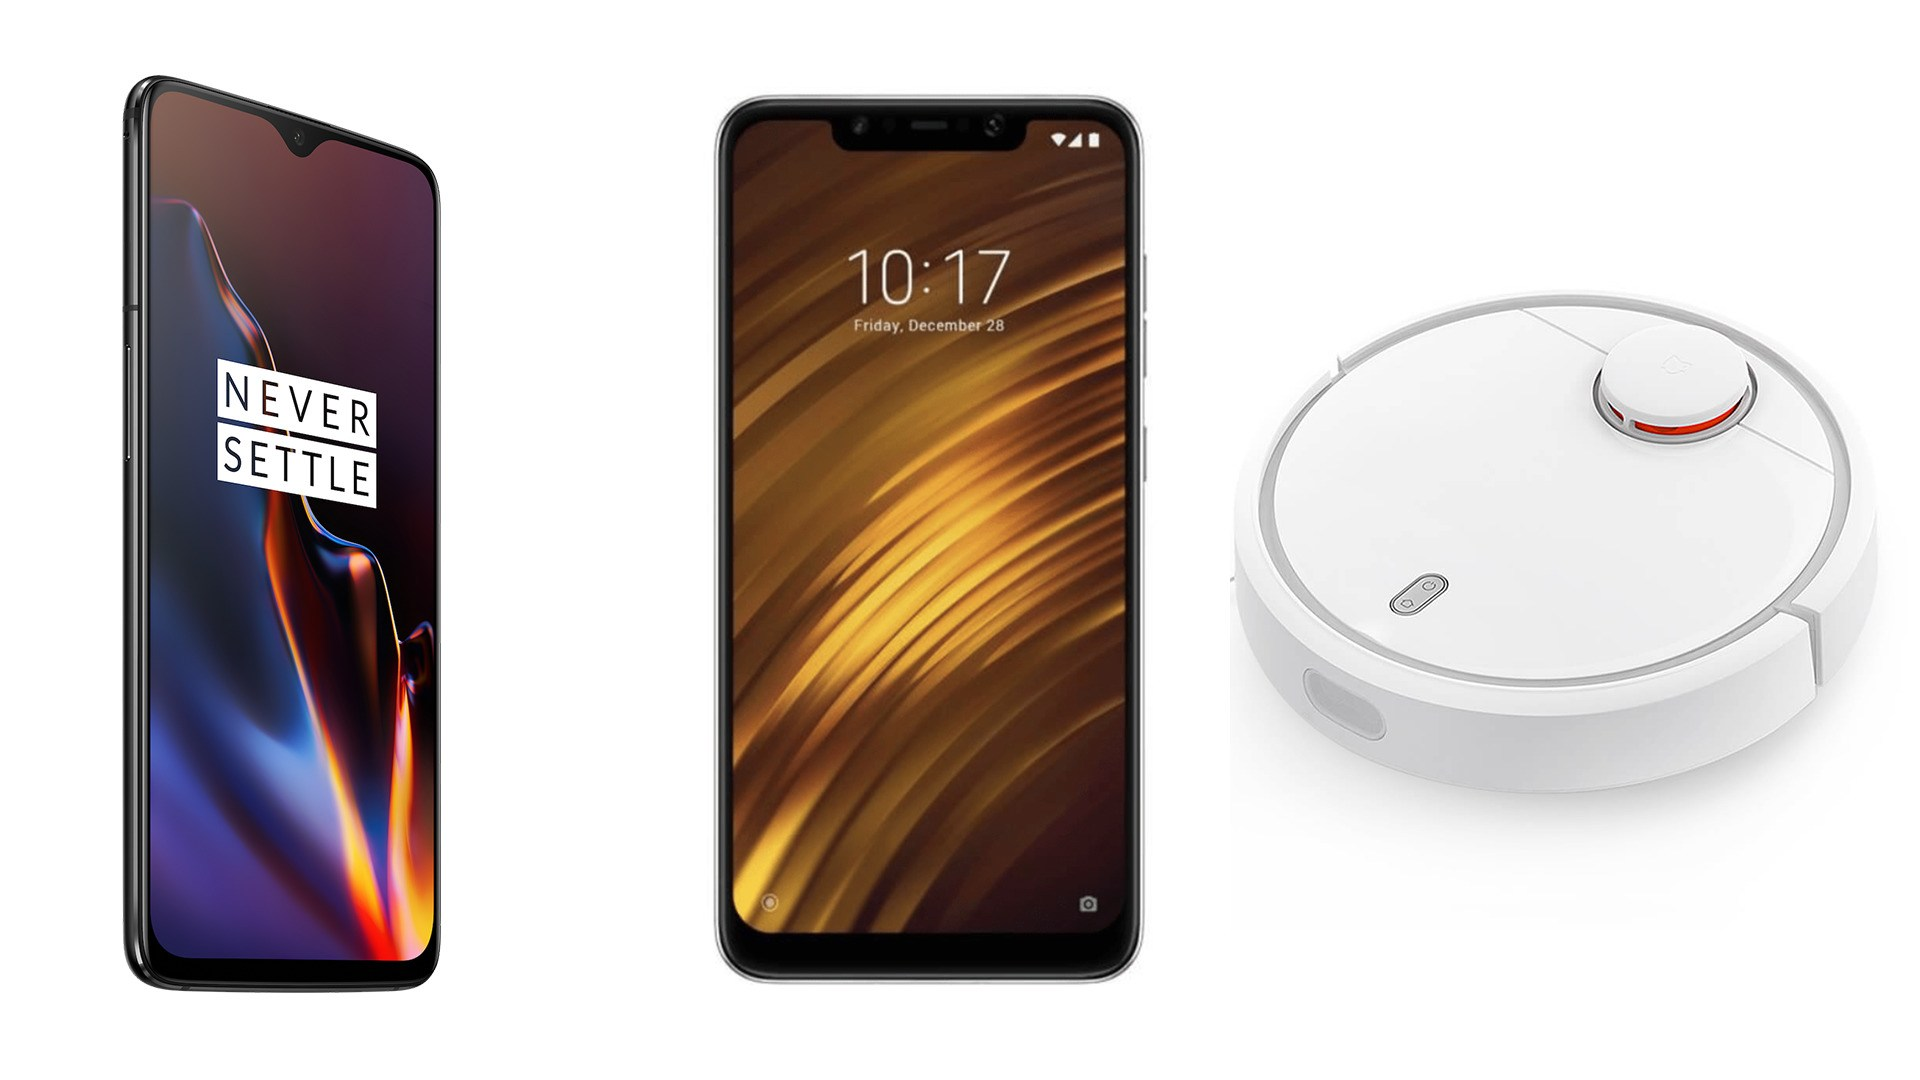 Xiaomi Pocophone F1 (128 Go) à 312 euros, OnePlus 6T à 462 euros et Xiaomi Mi Robot à 246 euros